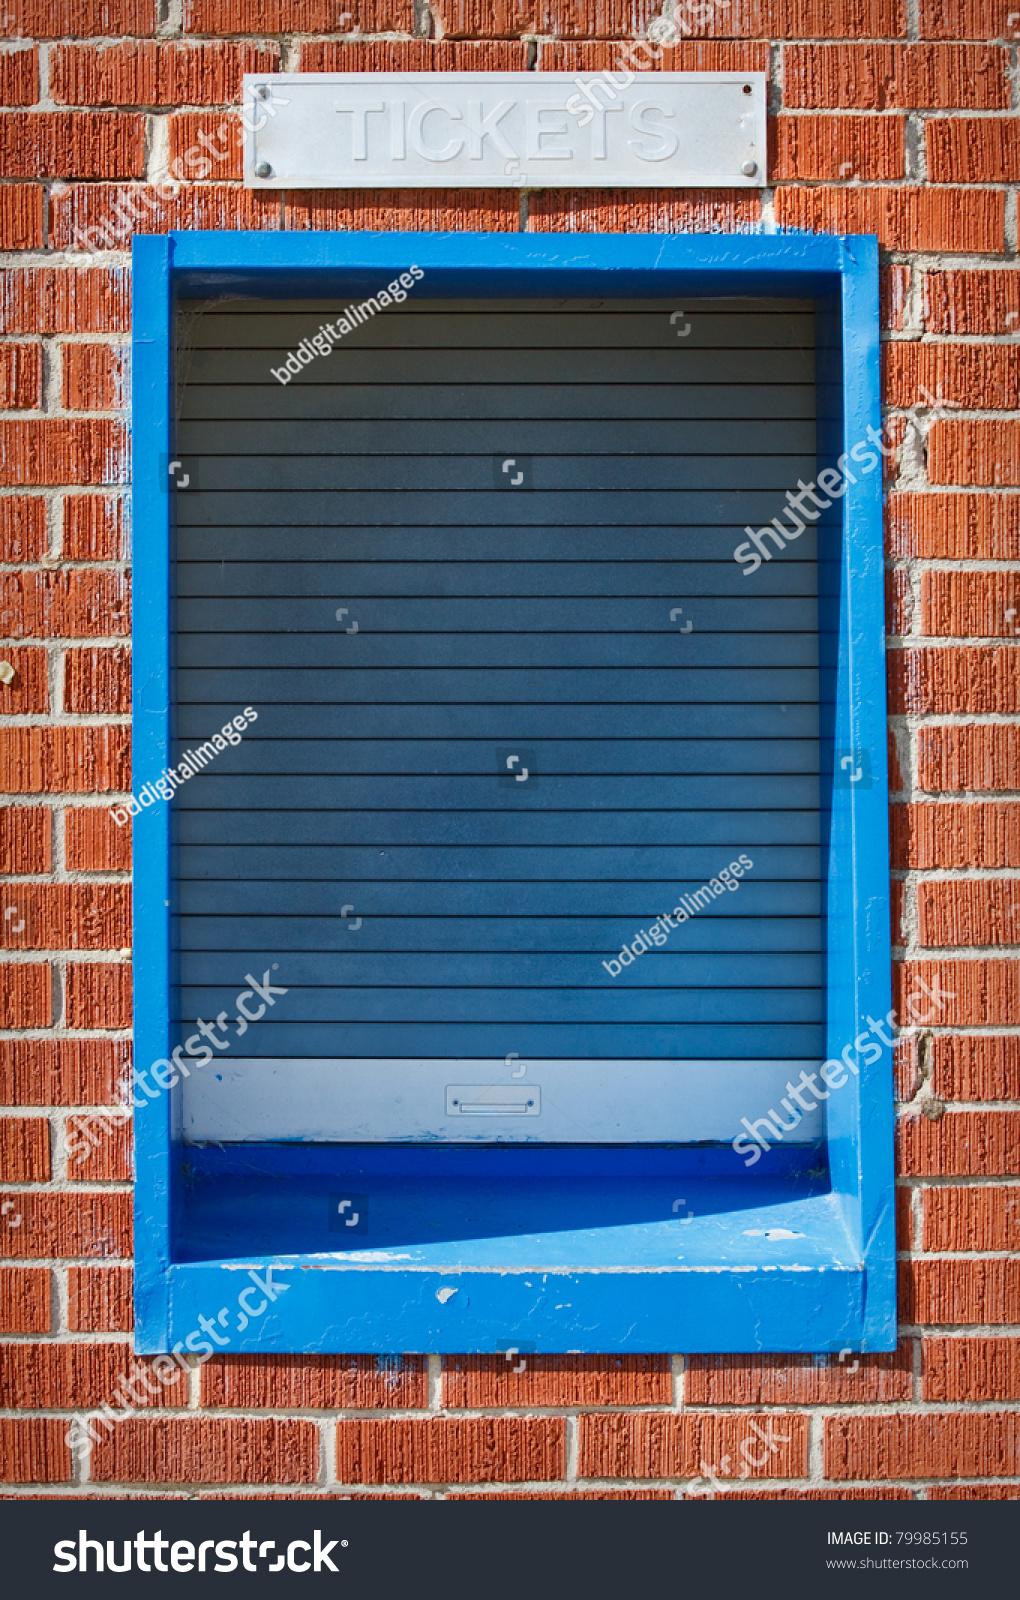 Closed ticket window sports arena stock photo